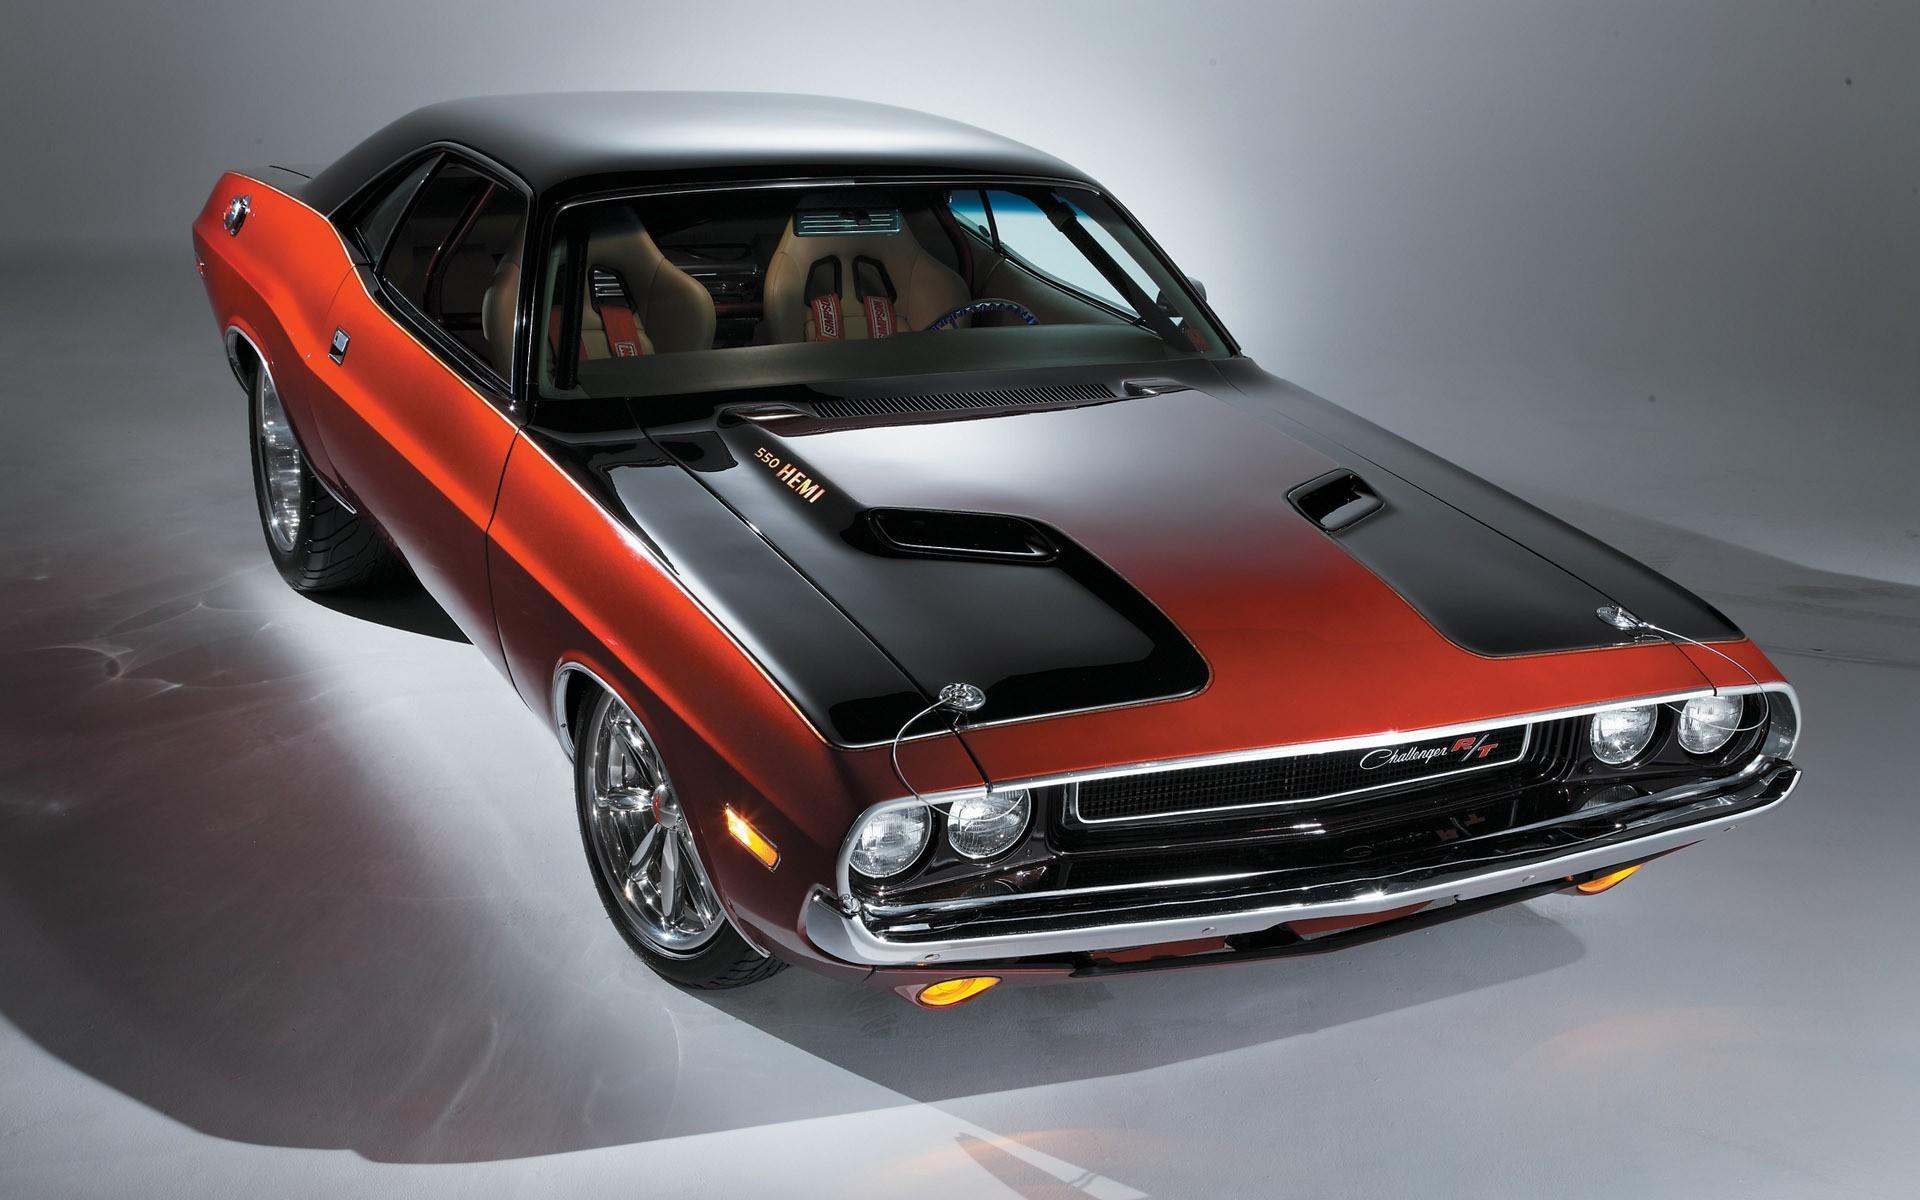 1920x1200 px car challenger Dodge Dodge Challenger 1970 Dodge Challenger R T 690093